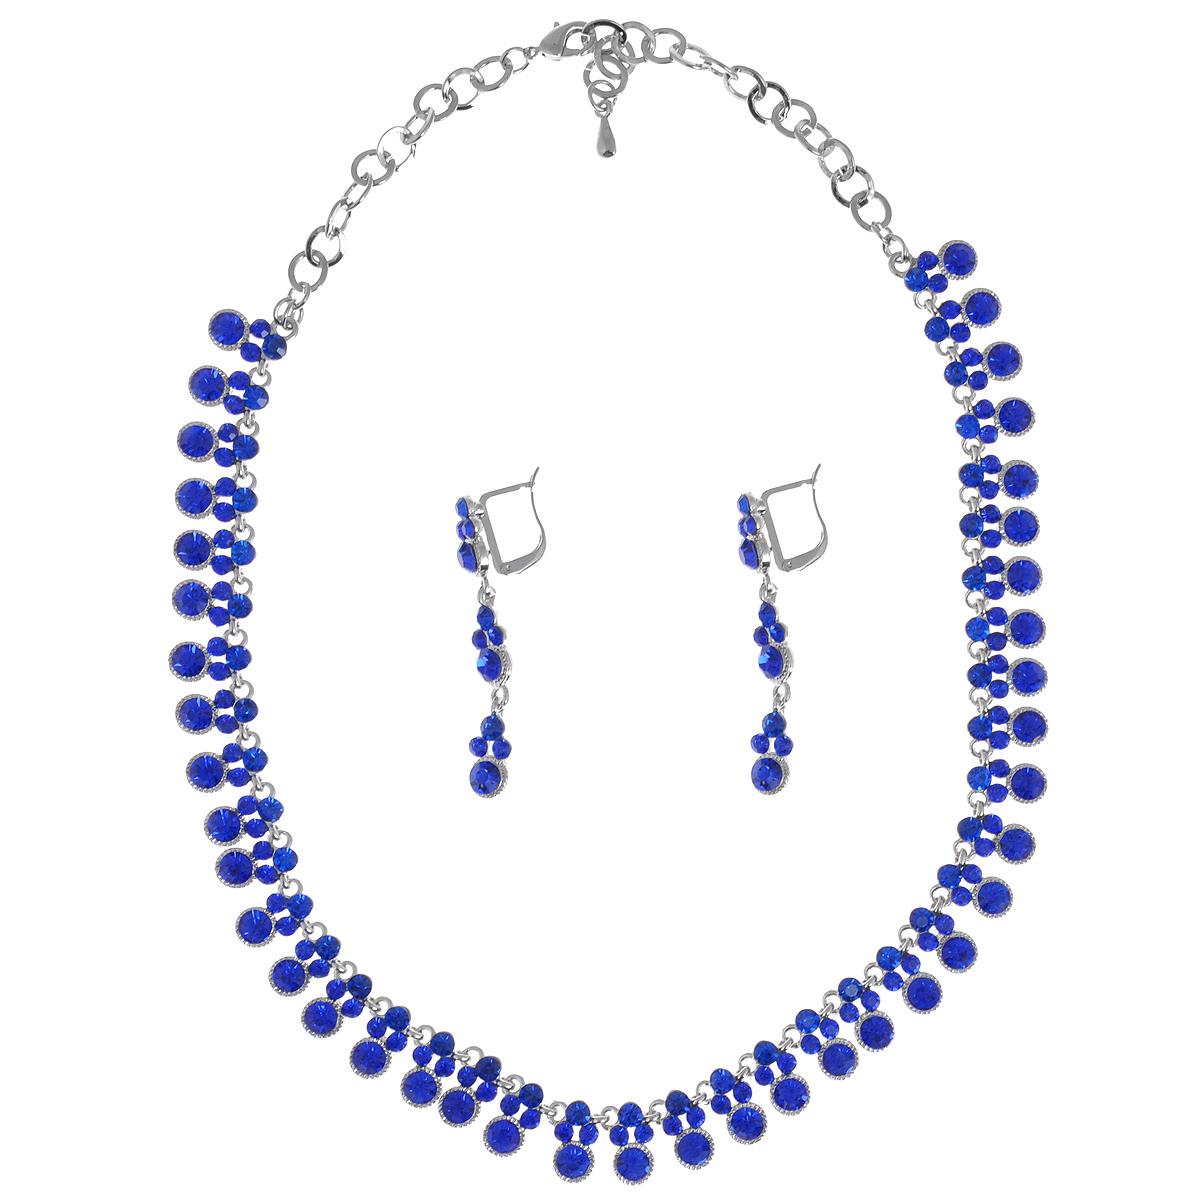 Комплект украшений Taya: колье, серьги, цвет: темно-синий, серебристый. T-B-9534